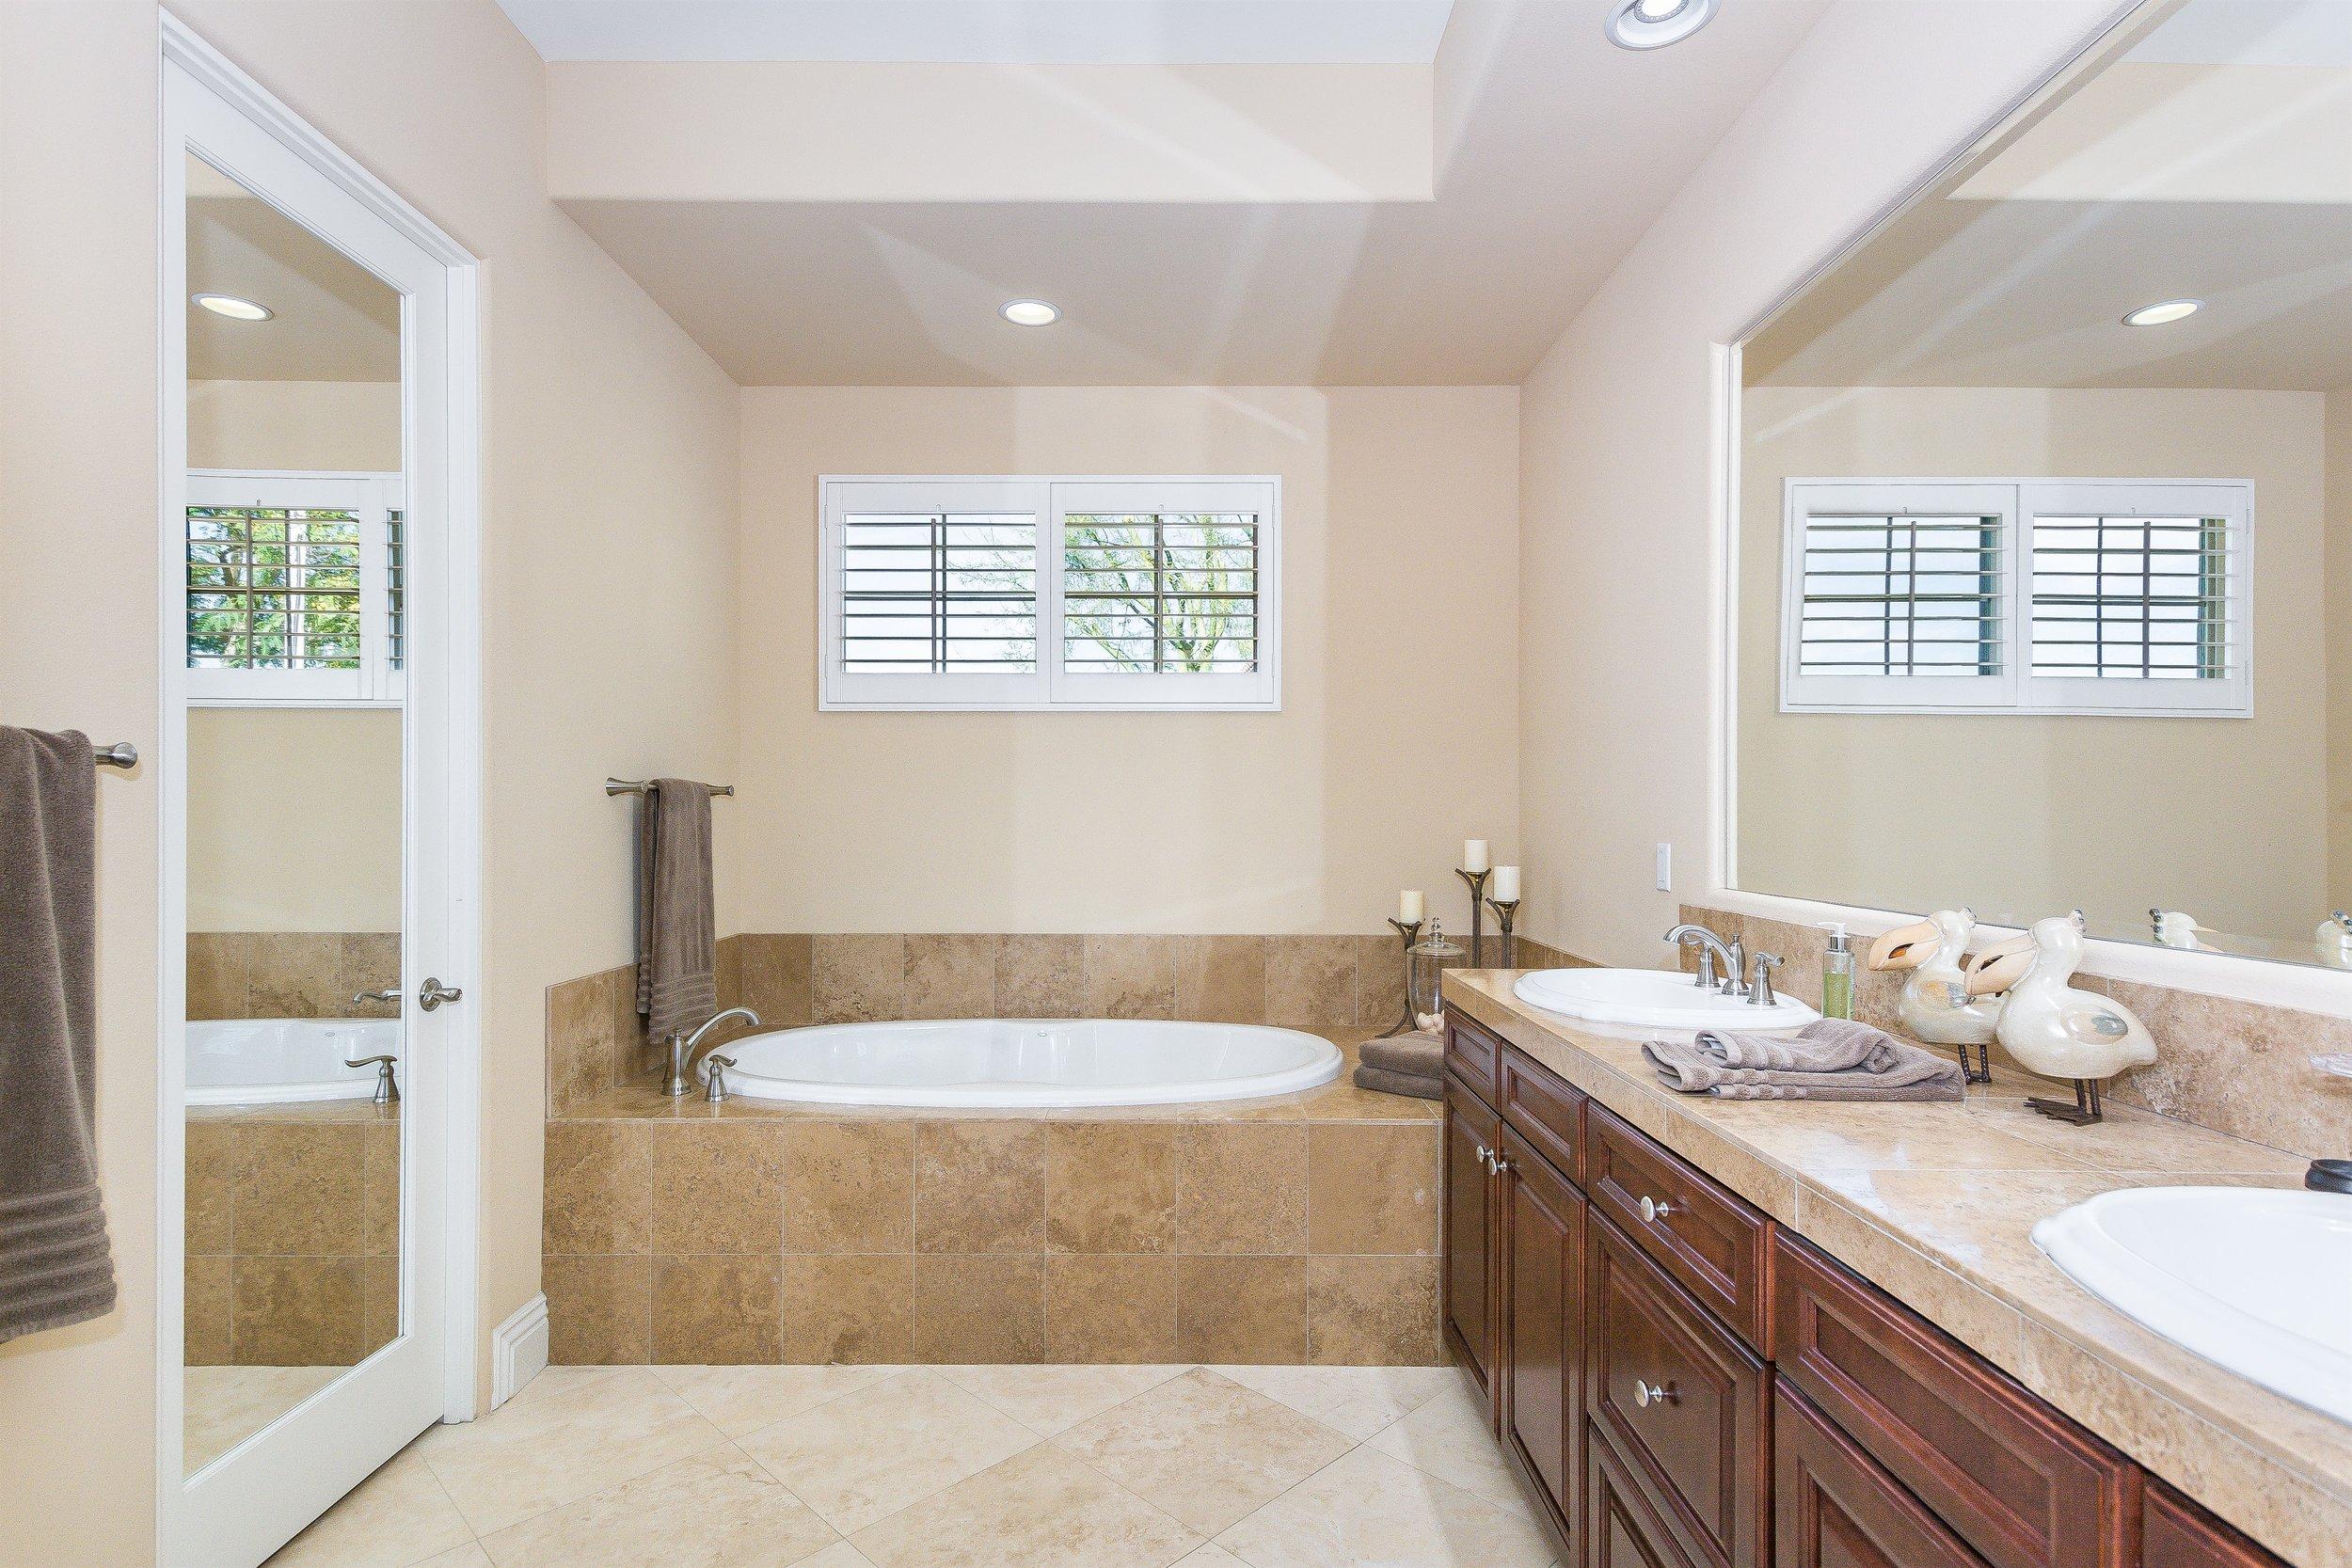 021_Master Suite 2 Bath.jpg